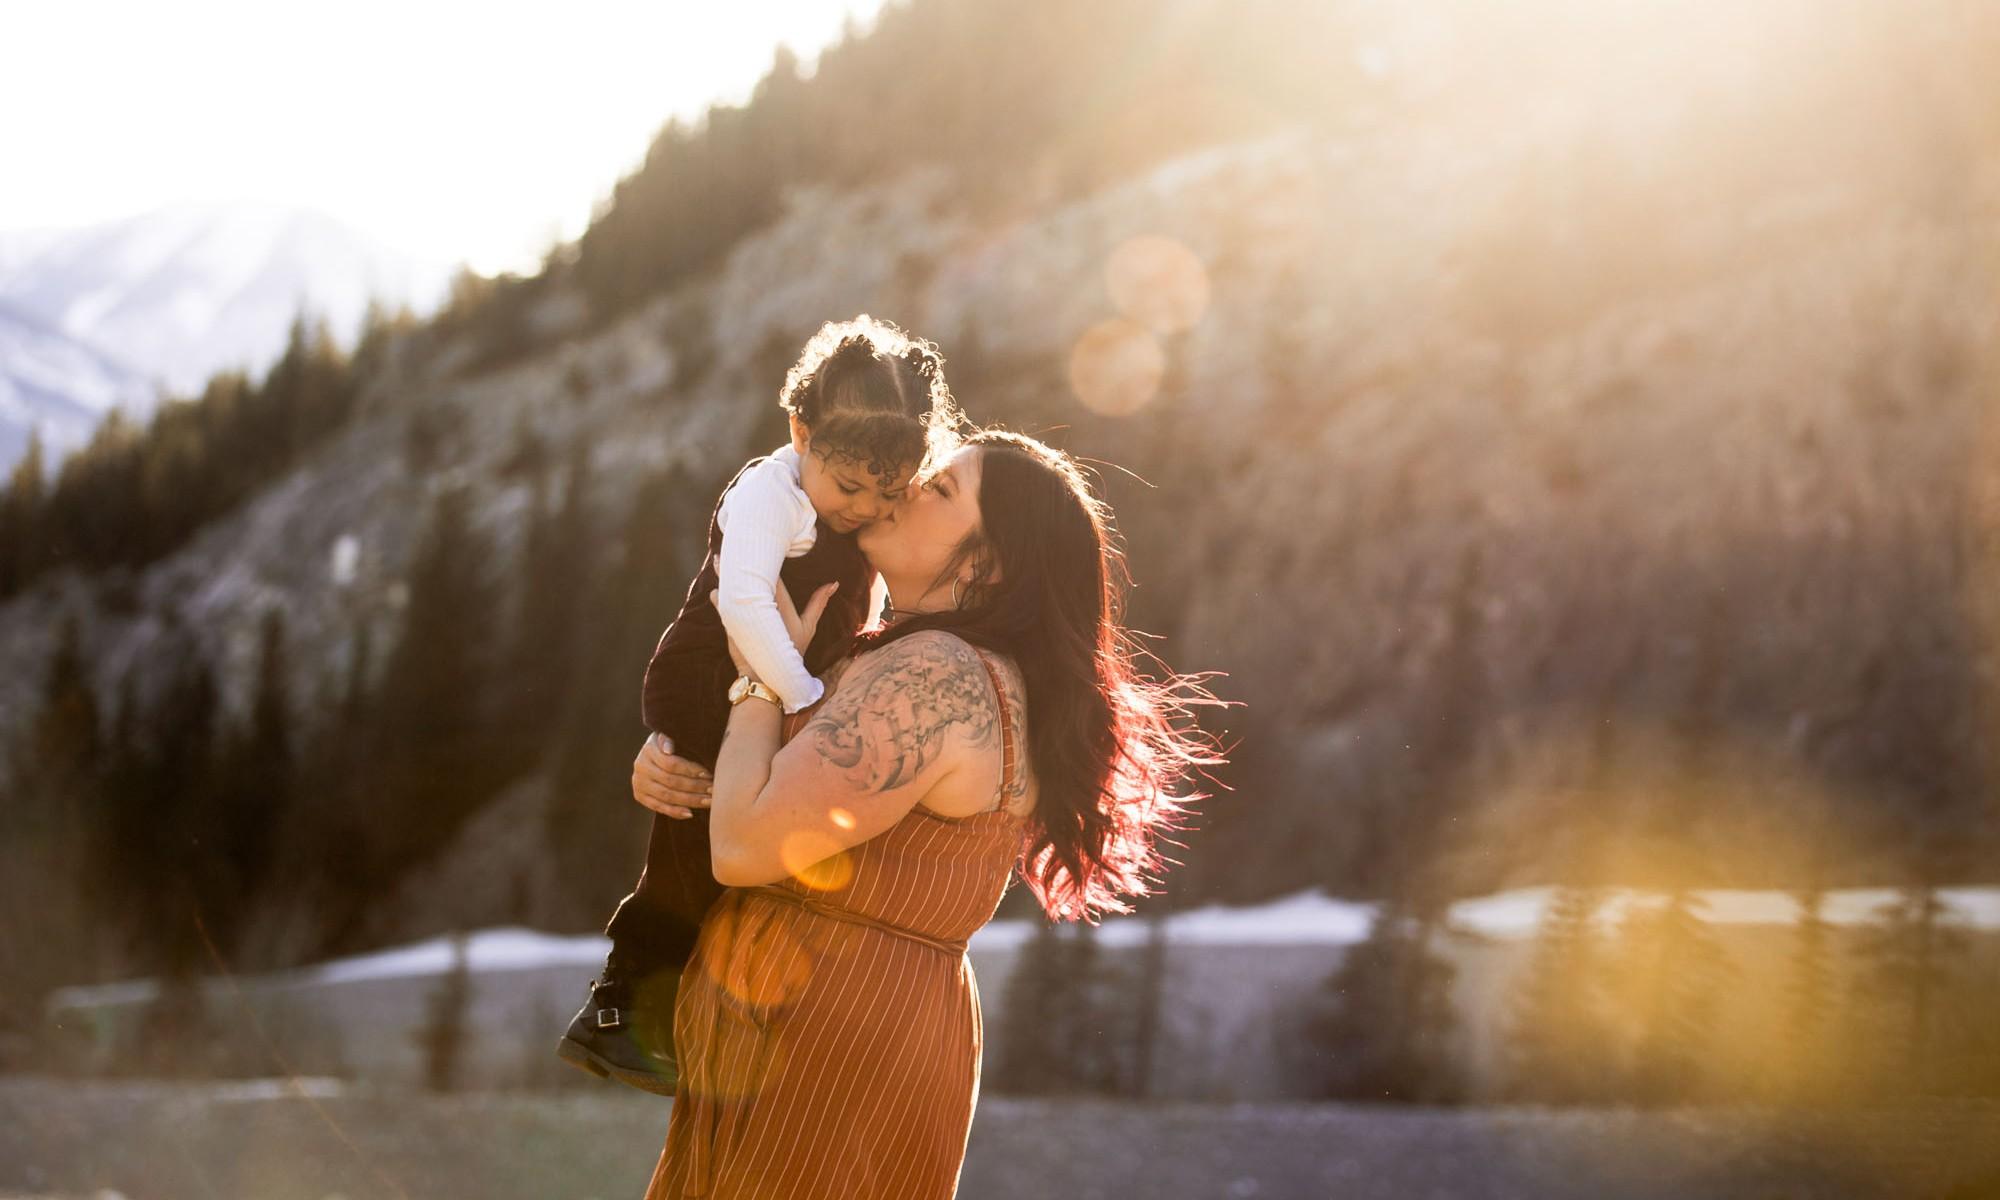 Calgary and Kananaskis mountains family photographer - family photos at sunset